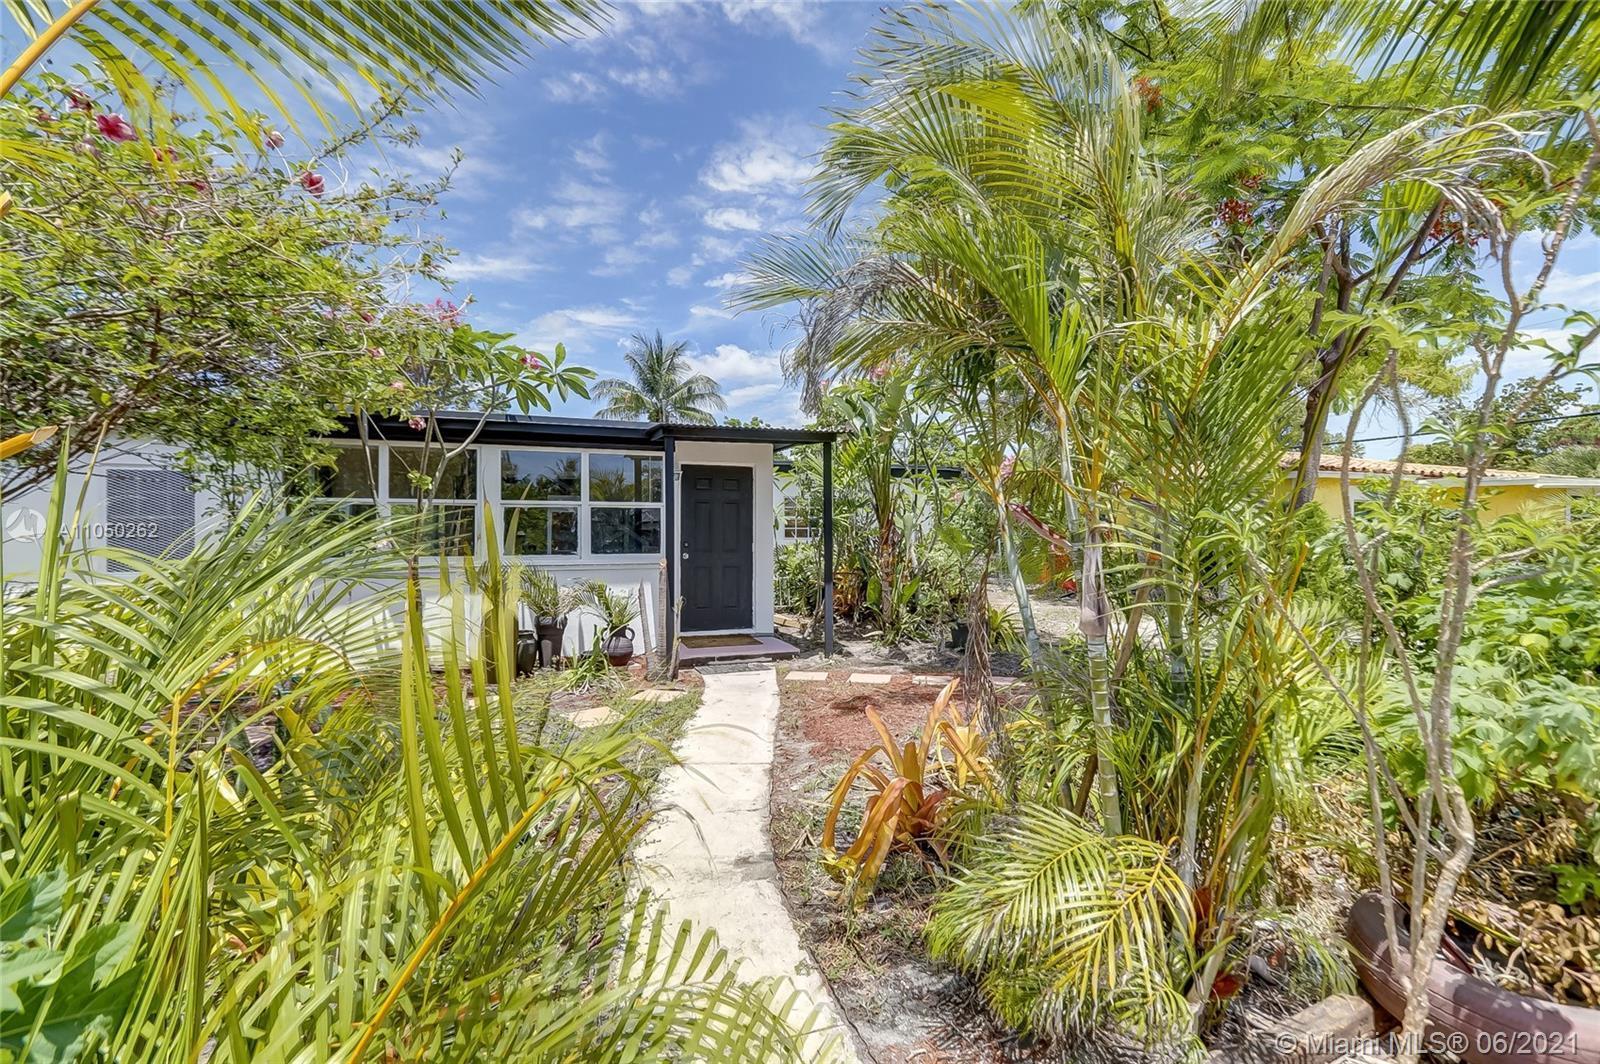 Charming 4 Bedroom 2 bathroom home in very desirable East Ft. Lauderdale Neighborhood of Progresso.